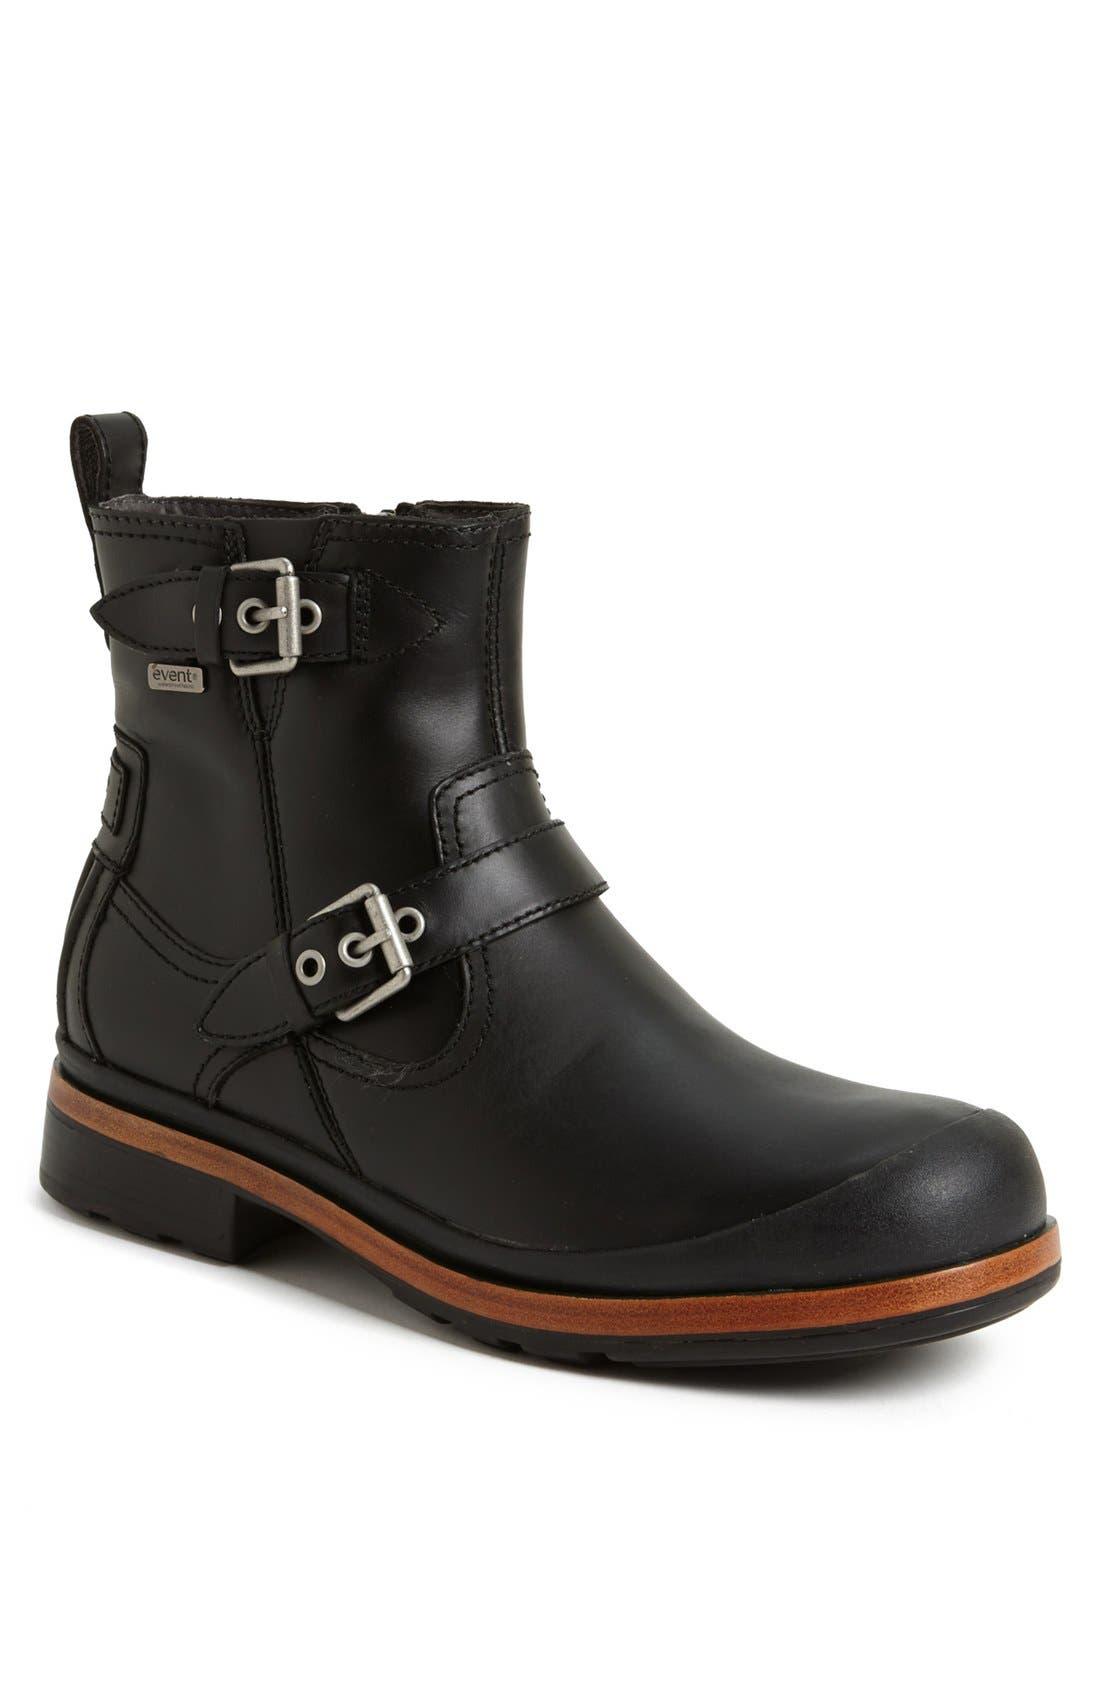 Main Image - UGG® Australia 'Alston' Zip Boot